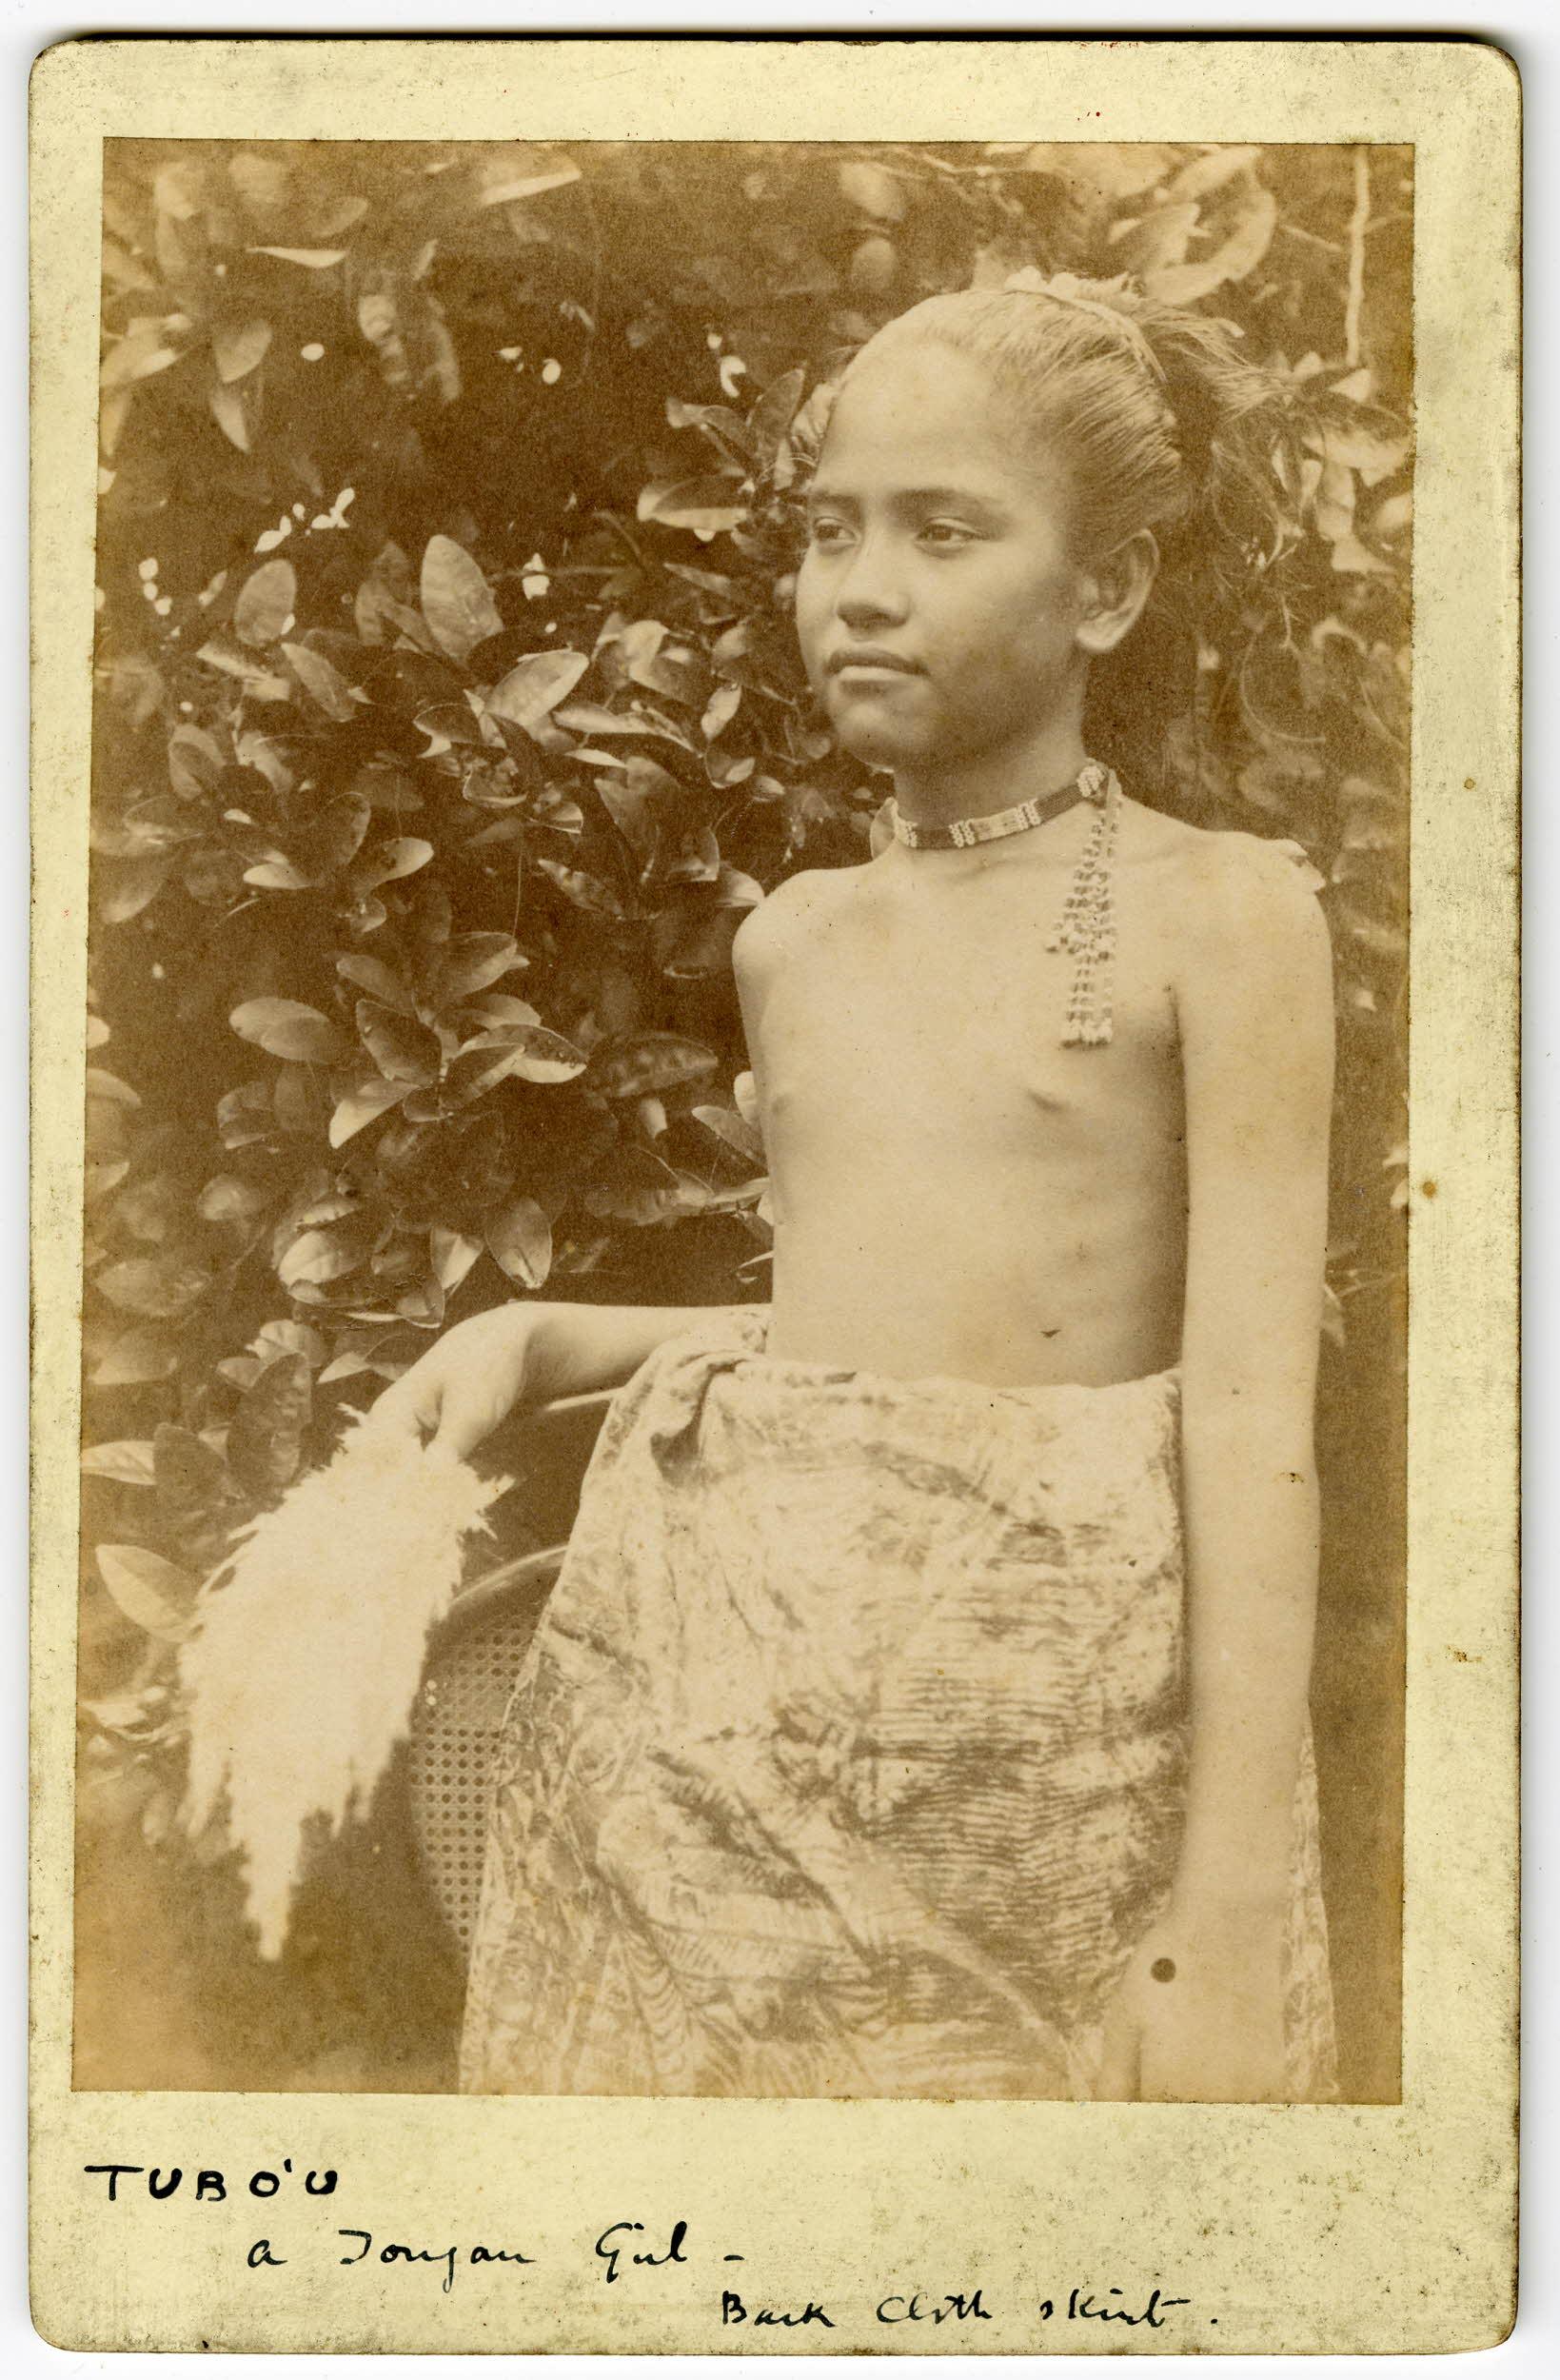 A Postcard from Tubo'u